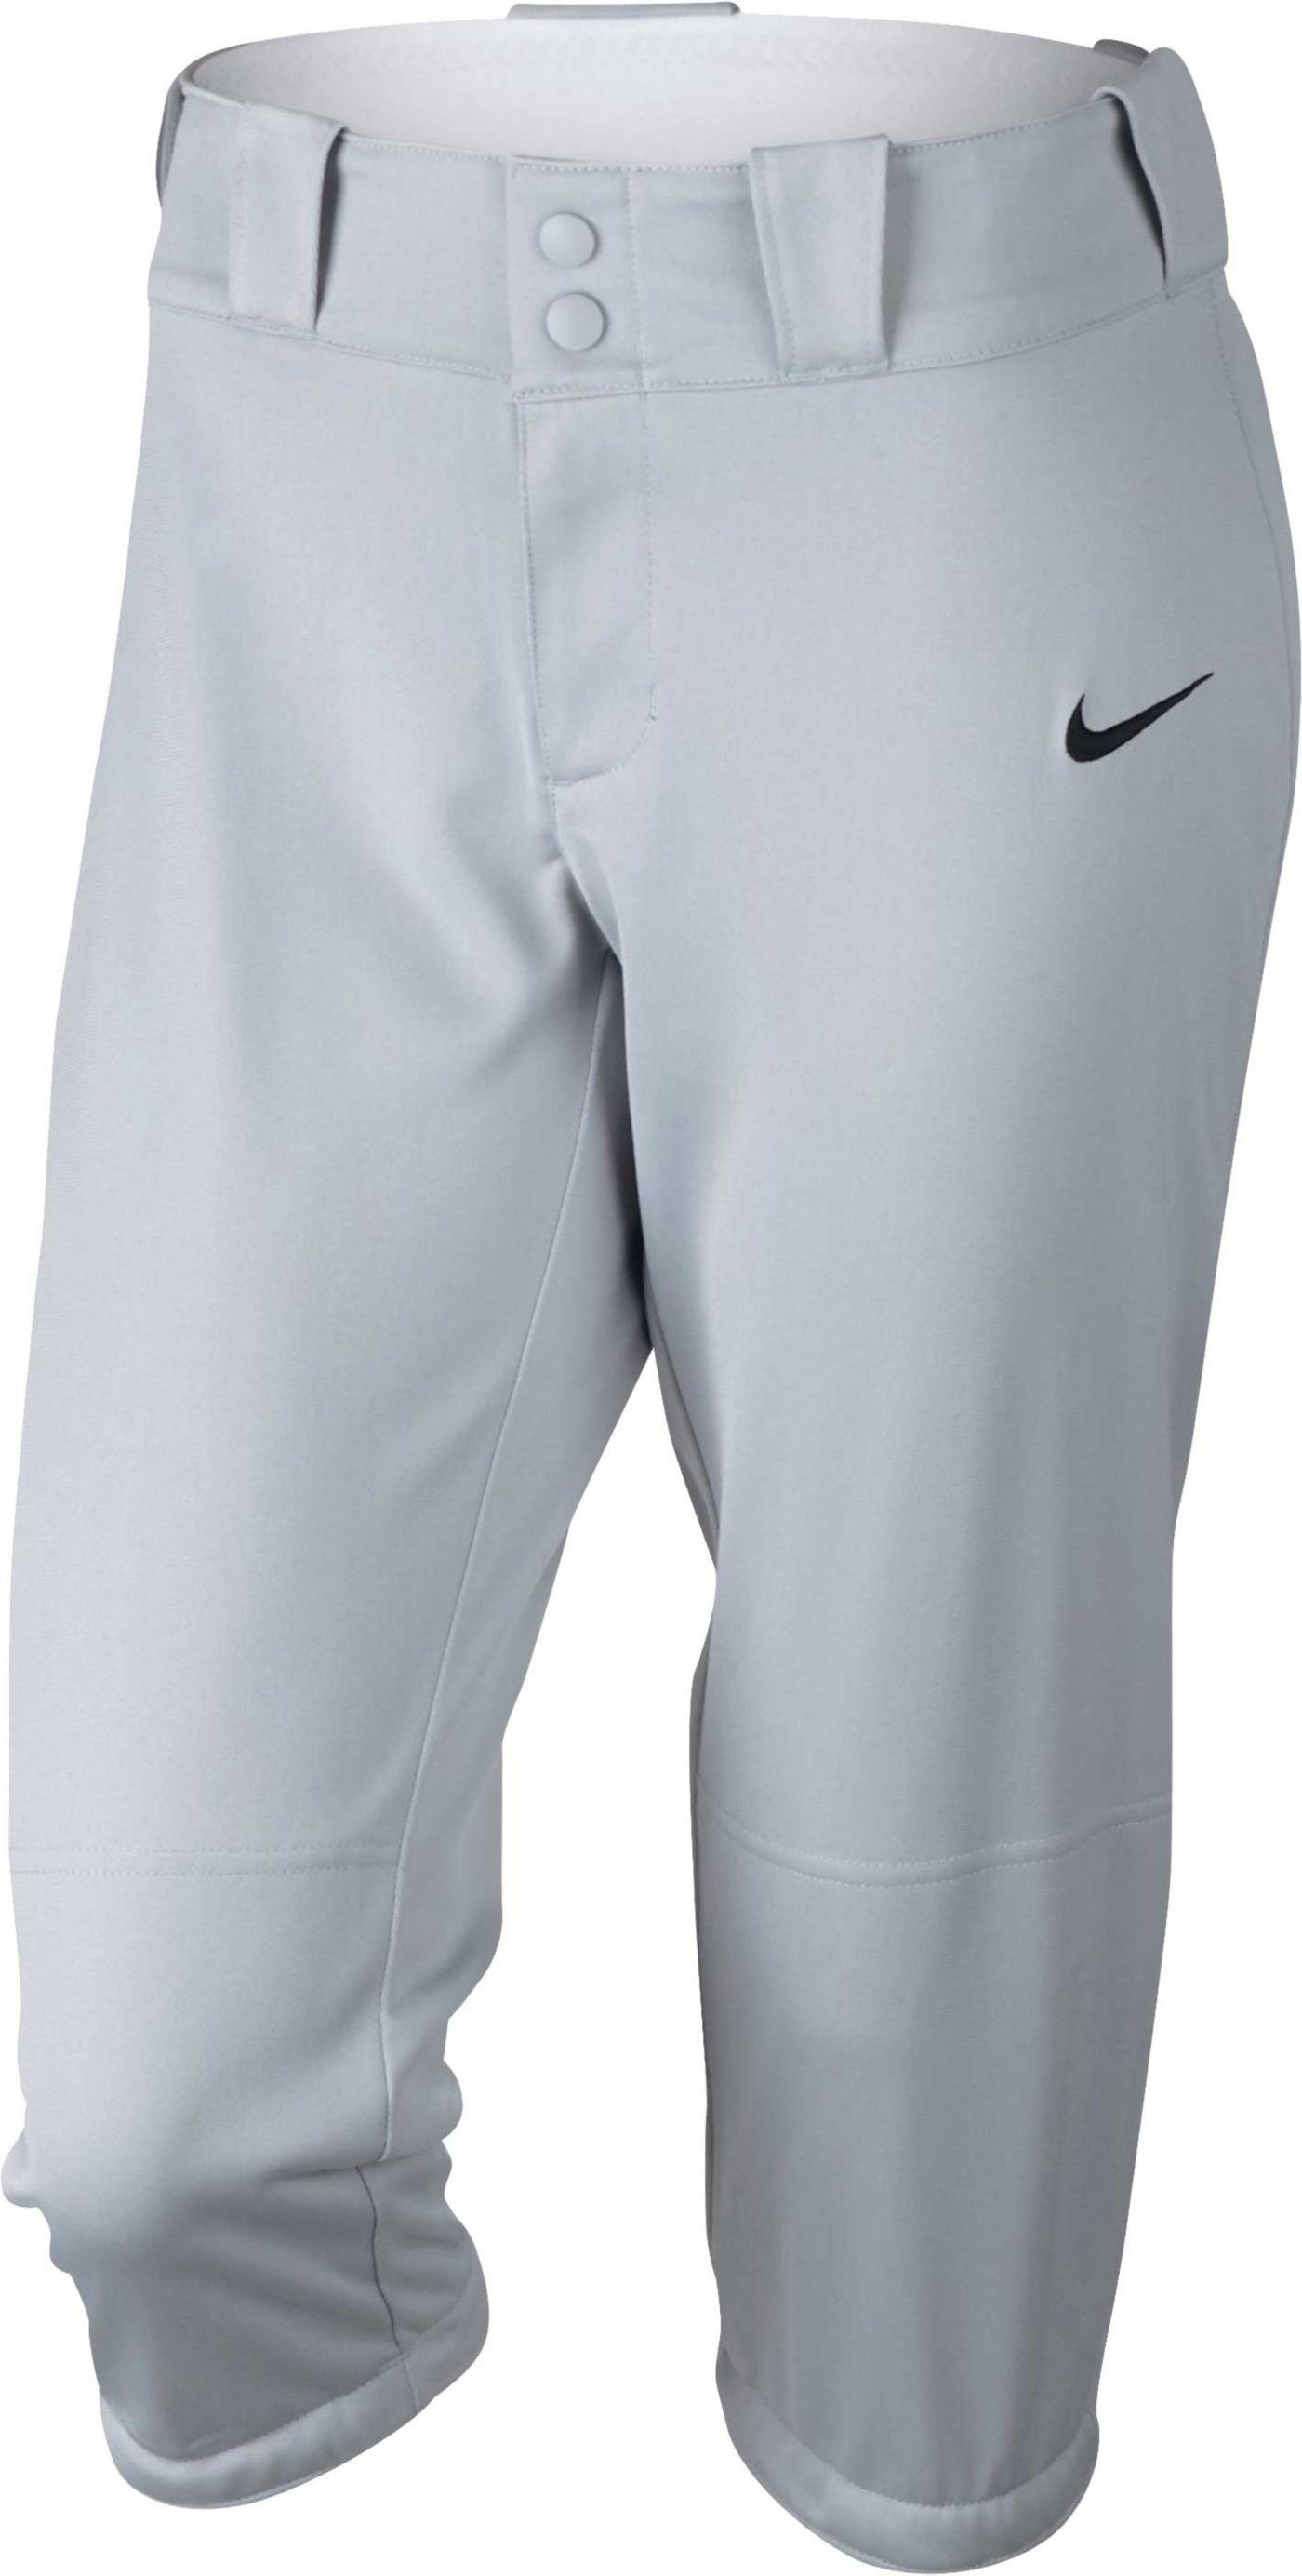 Nike Women's Diamond Invader ¾ Length Fastpitch Pants